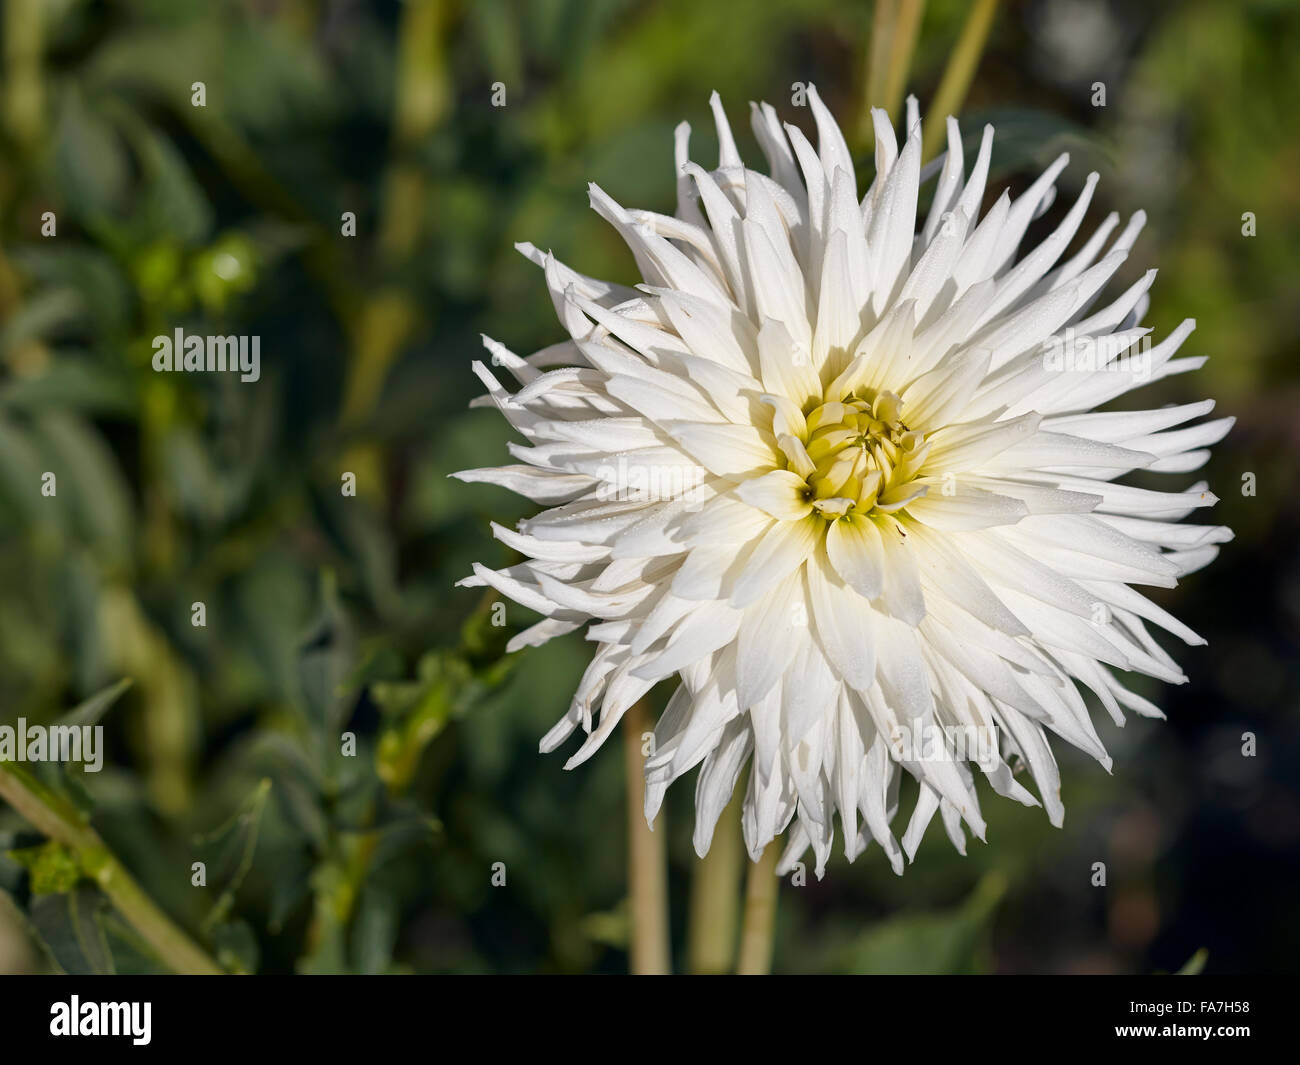 Big white flower petals stock photos big white flower petals stock dahlia flower close up stock image mightylinksfo